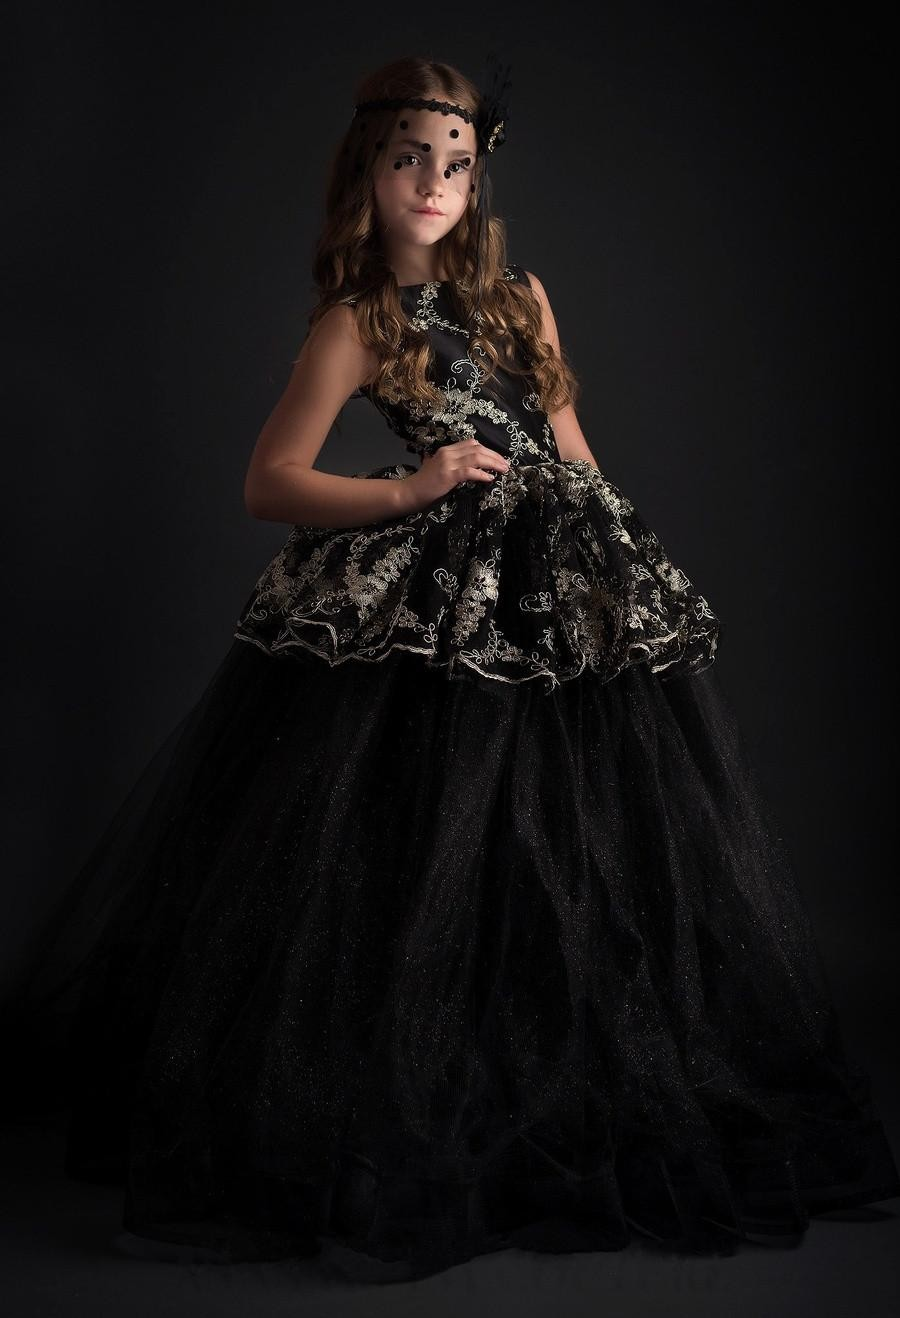 Gorgeous Vestidos Primera Comunion Zipper Button Open V Back Lace Appliques Tulle Ball Gowns Black Tulle Little Girls Dresses 12 цена и фото